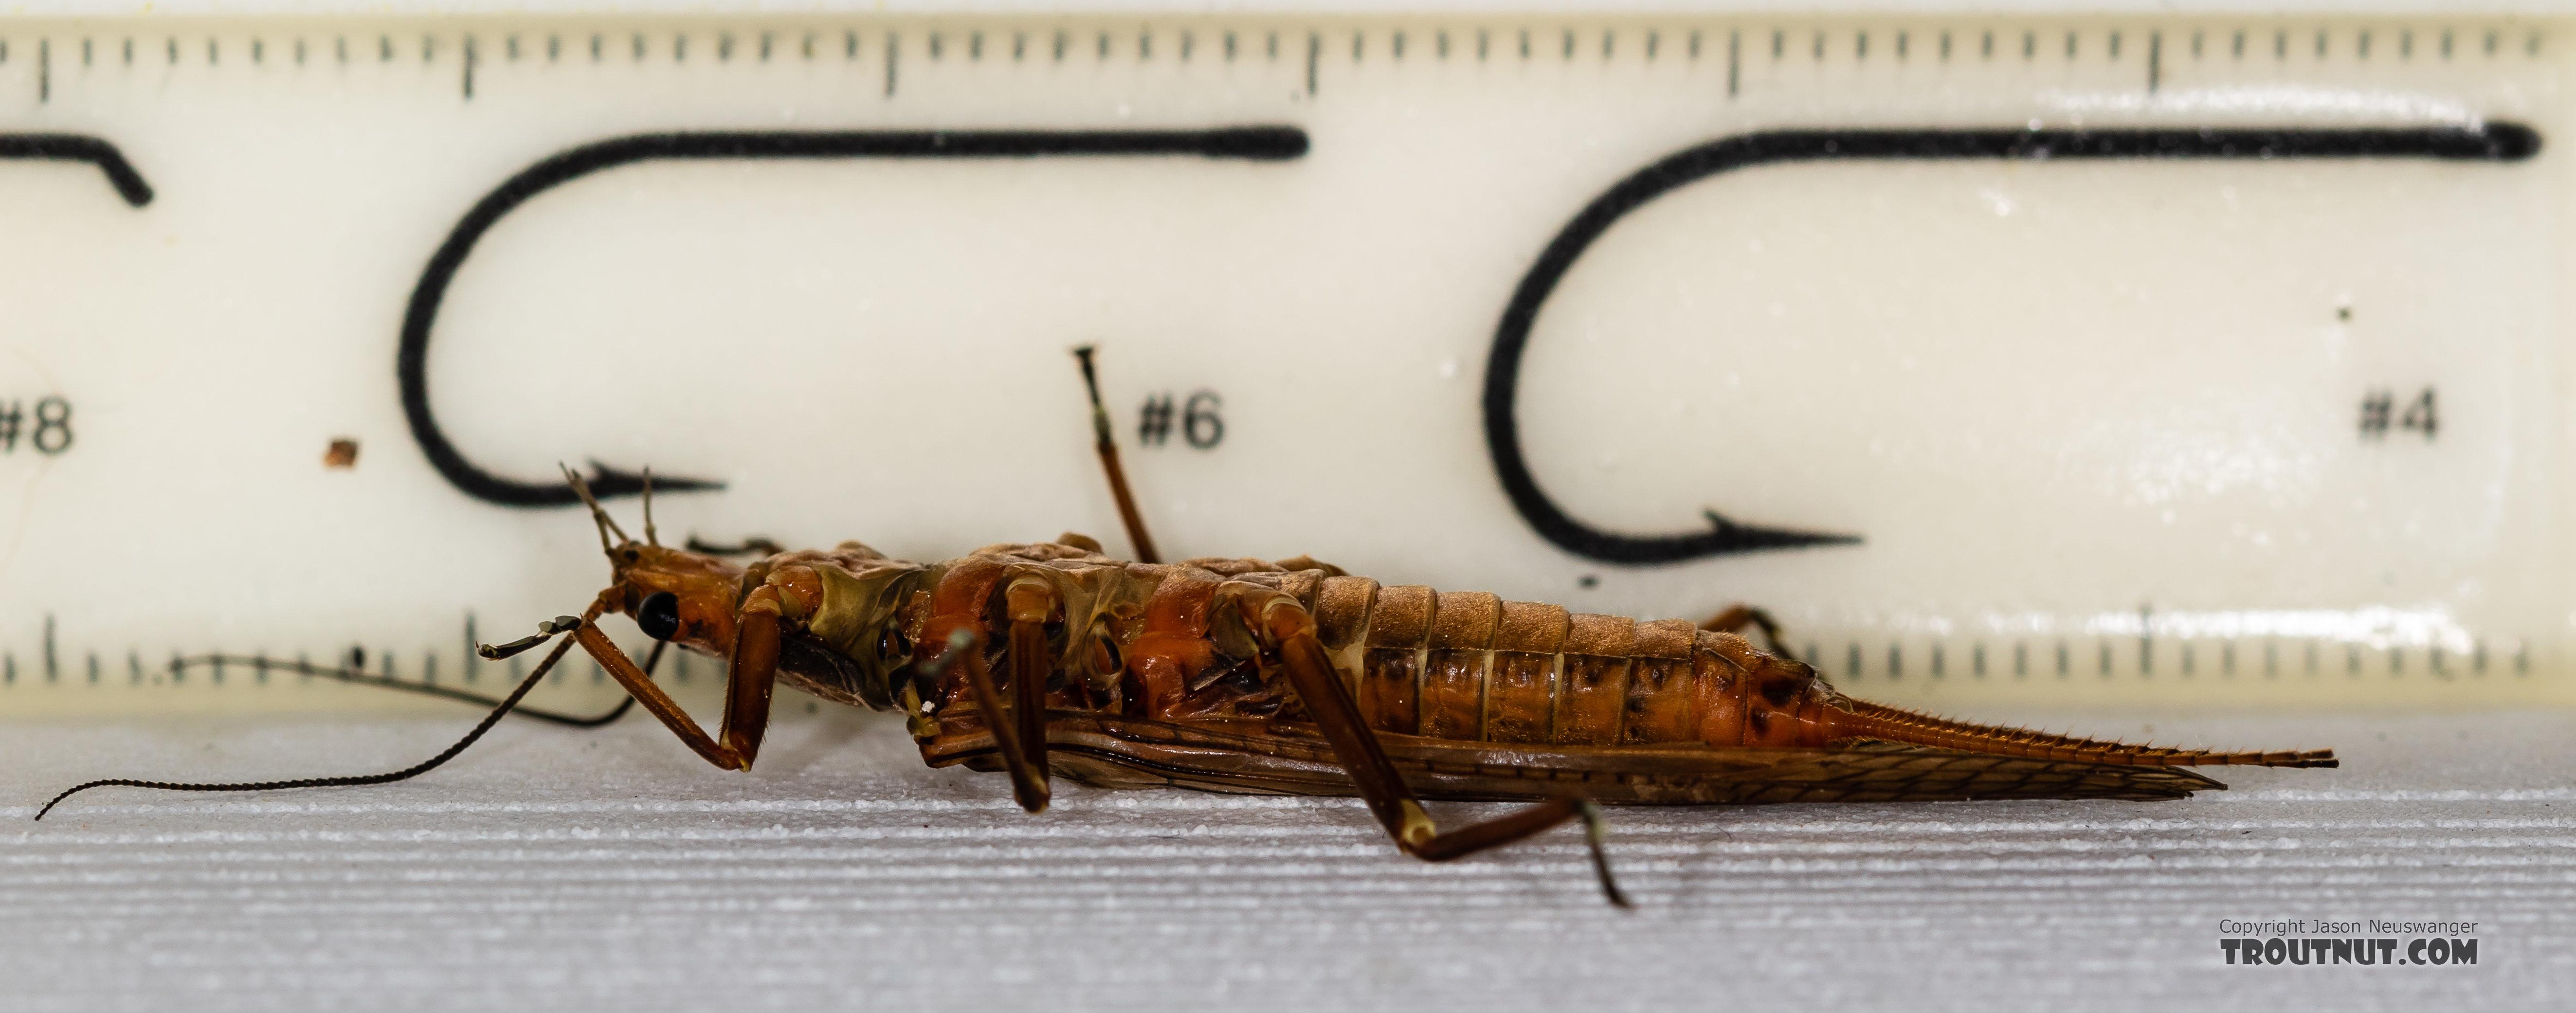 Female Hesperoperla pacifica (Golden Stone) Stonefly Adult from the Gallatin River in Montana